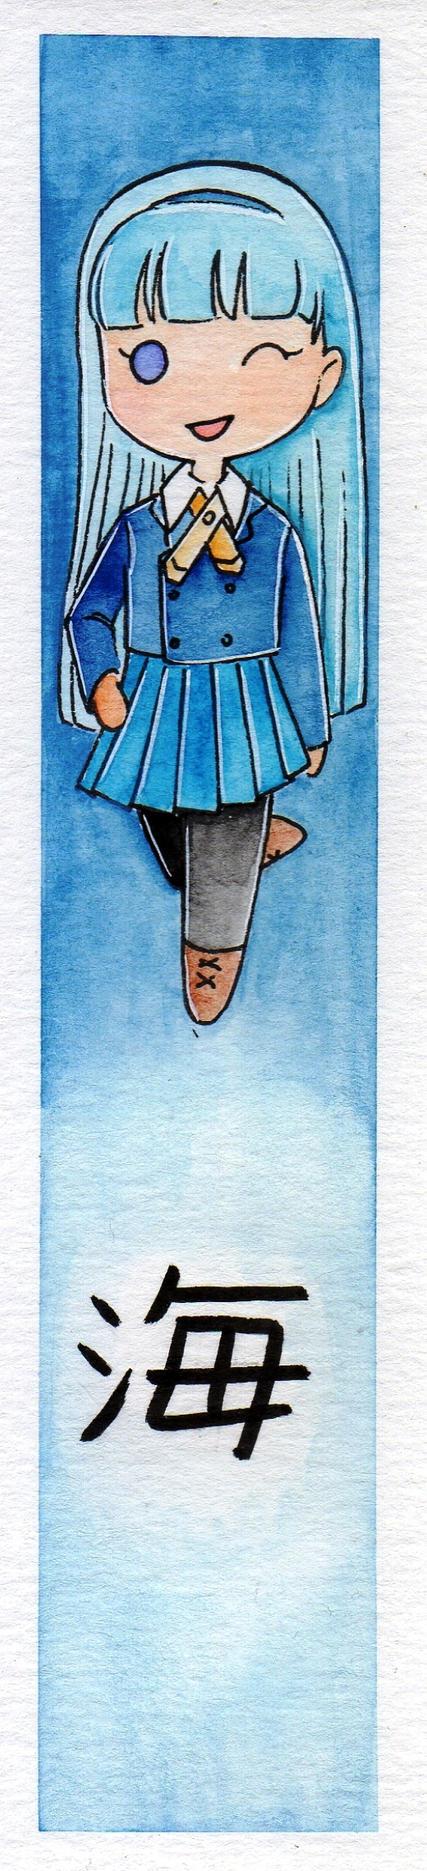 Umi Bookmark by Ka-miragem